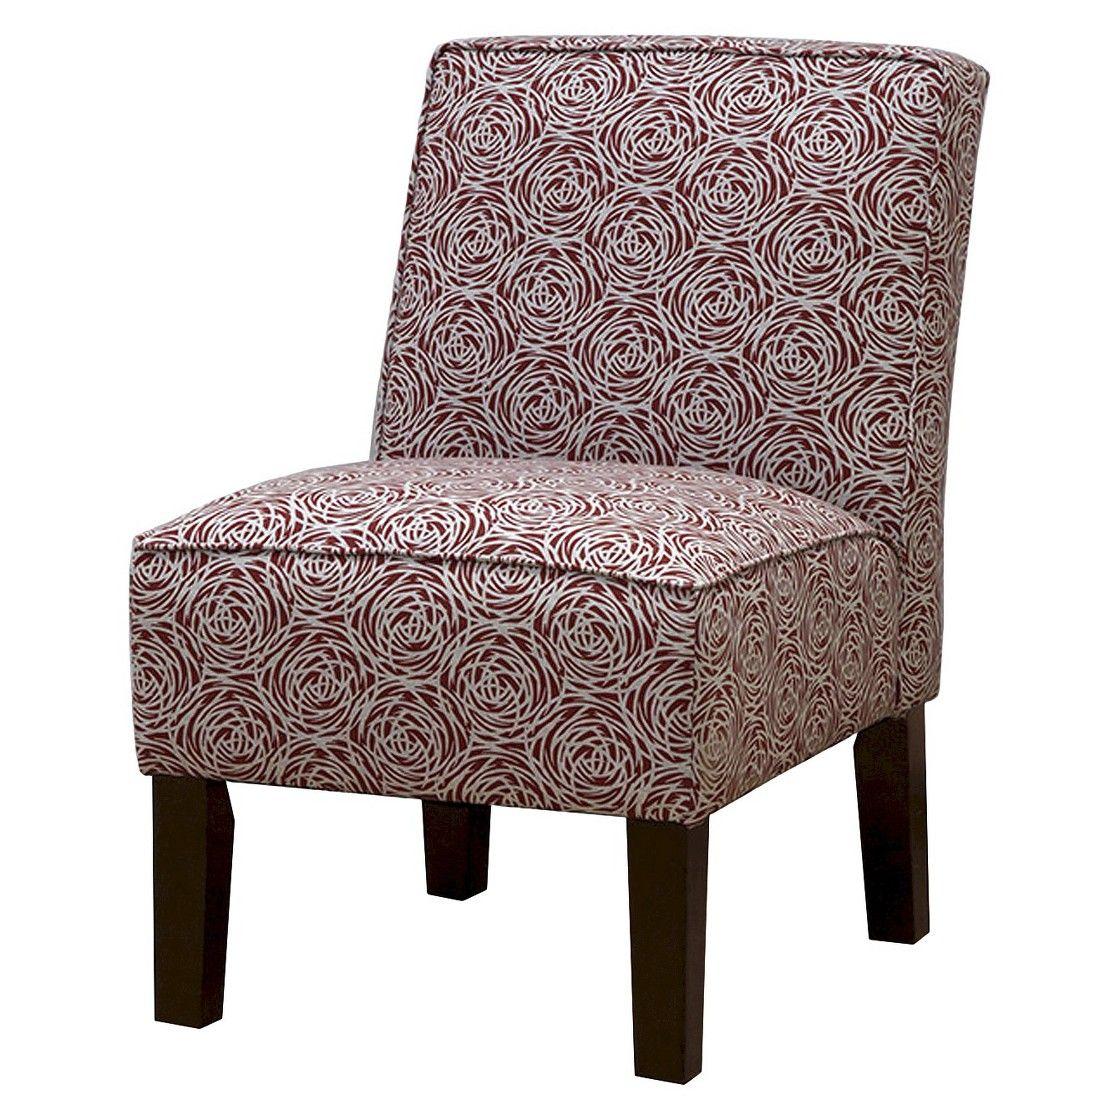 Burke Slipper Chair Prints Chair, Swivel recliner